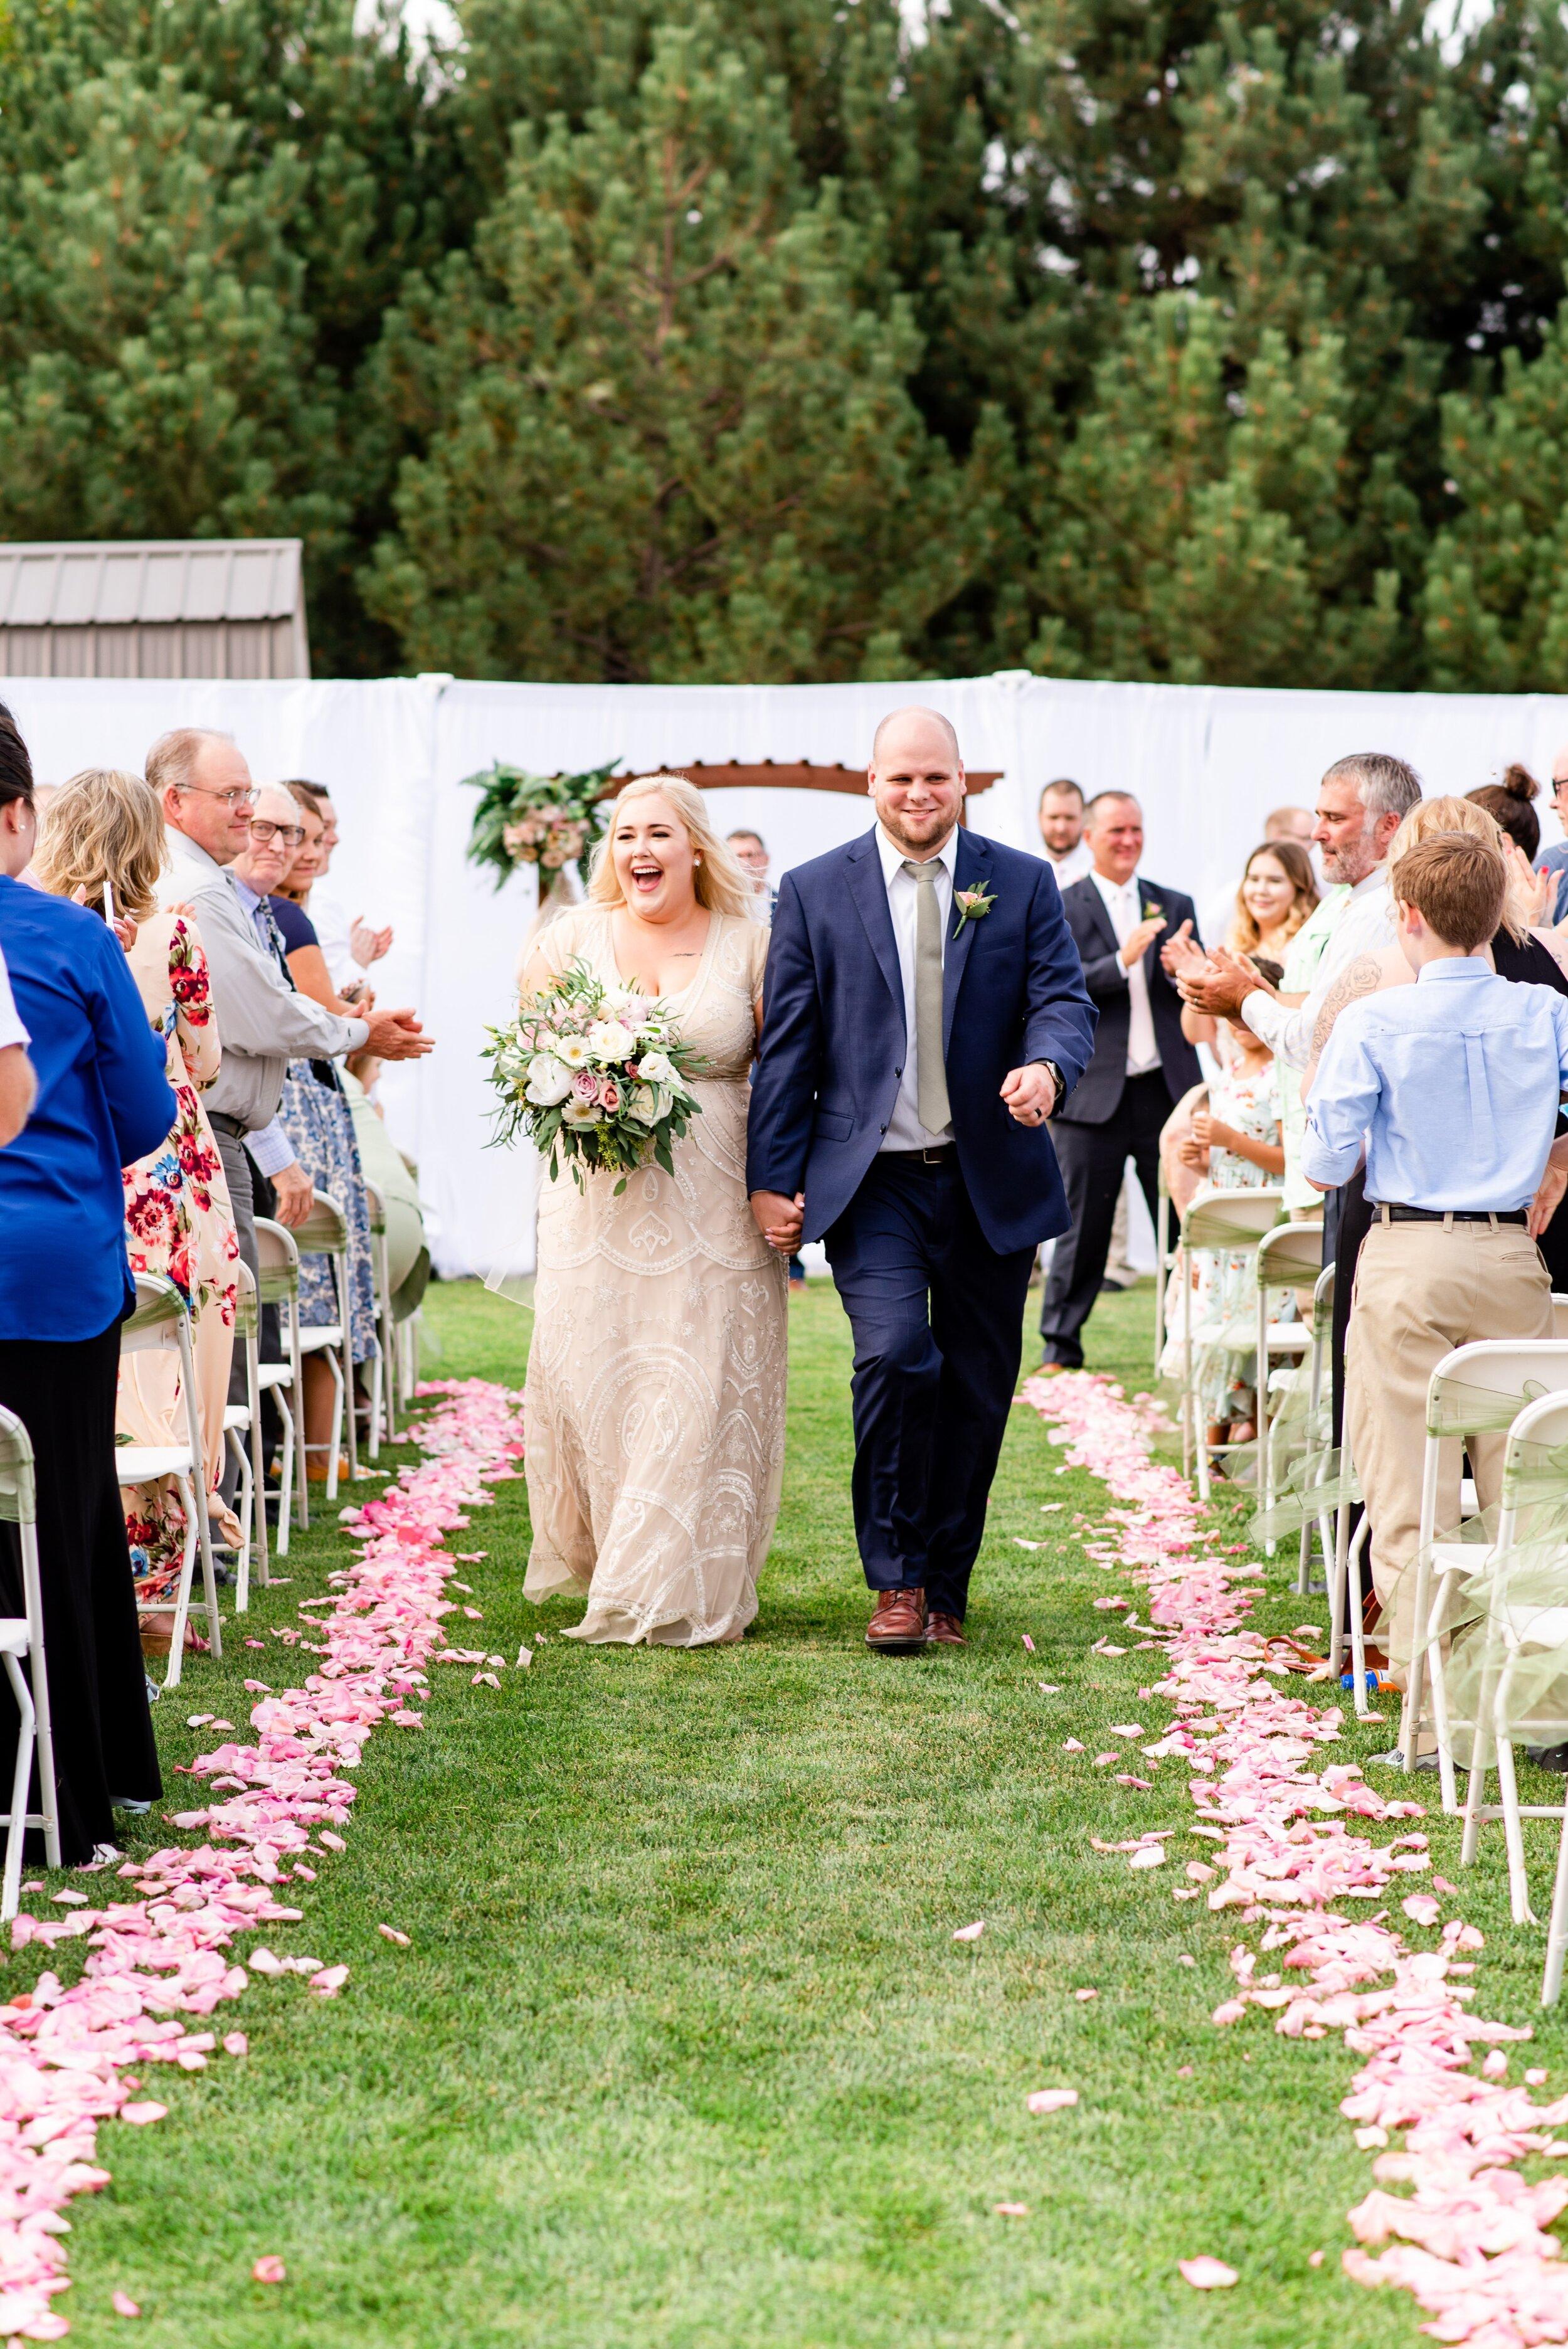 Bride & Groom Walking Down Aisle - Tri Cities Wedding Photographer - Morgan Tayler Photo & Design - Tri Cities Washington Backyard Wedding